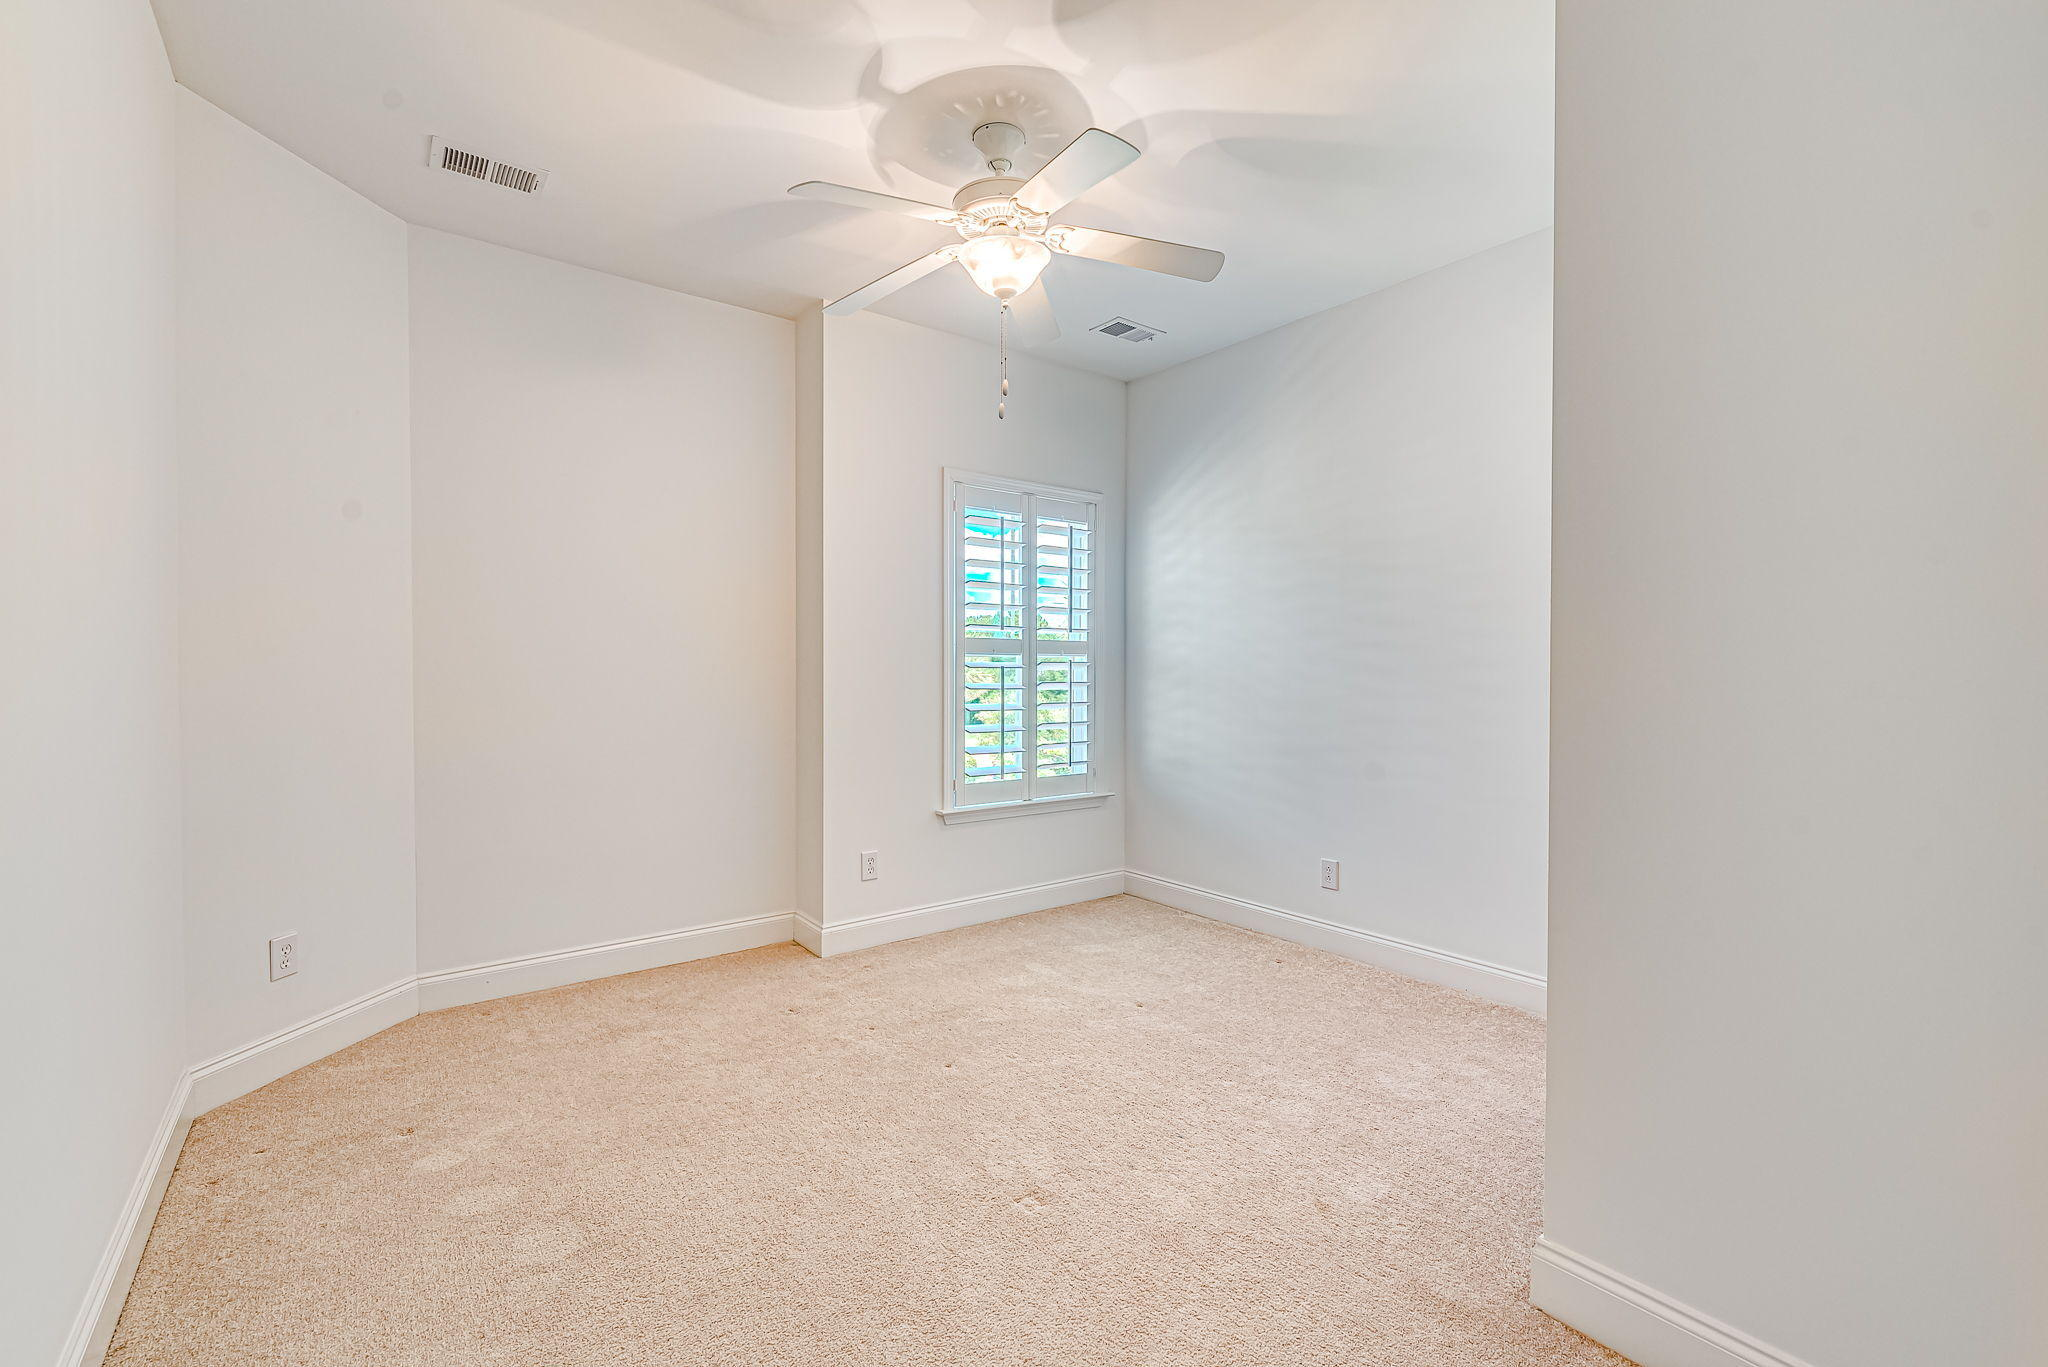 Dunes West Homes For Sale - 2476 Kings Gate, Mount Pleasant, SC - 35